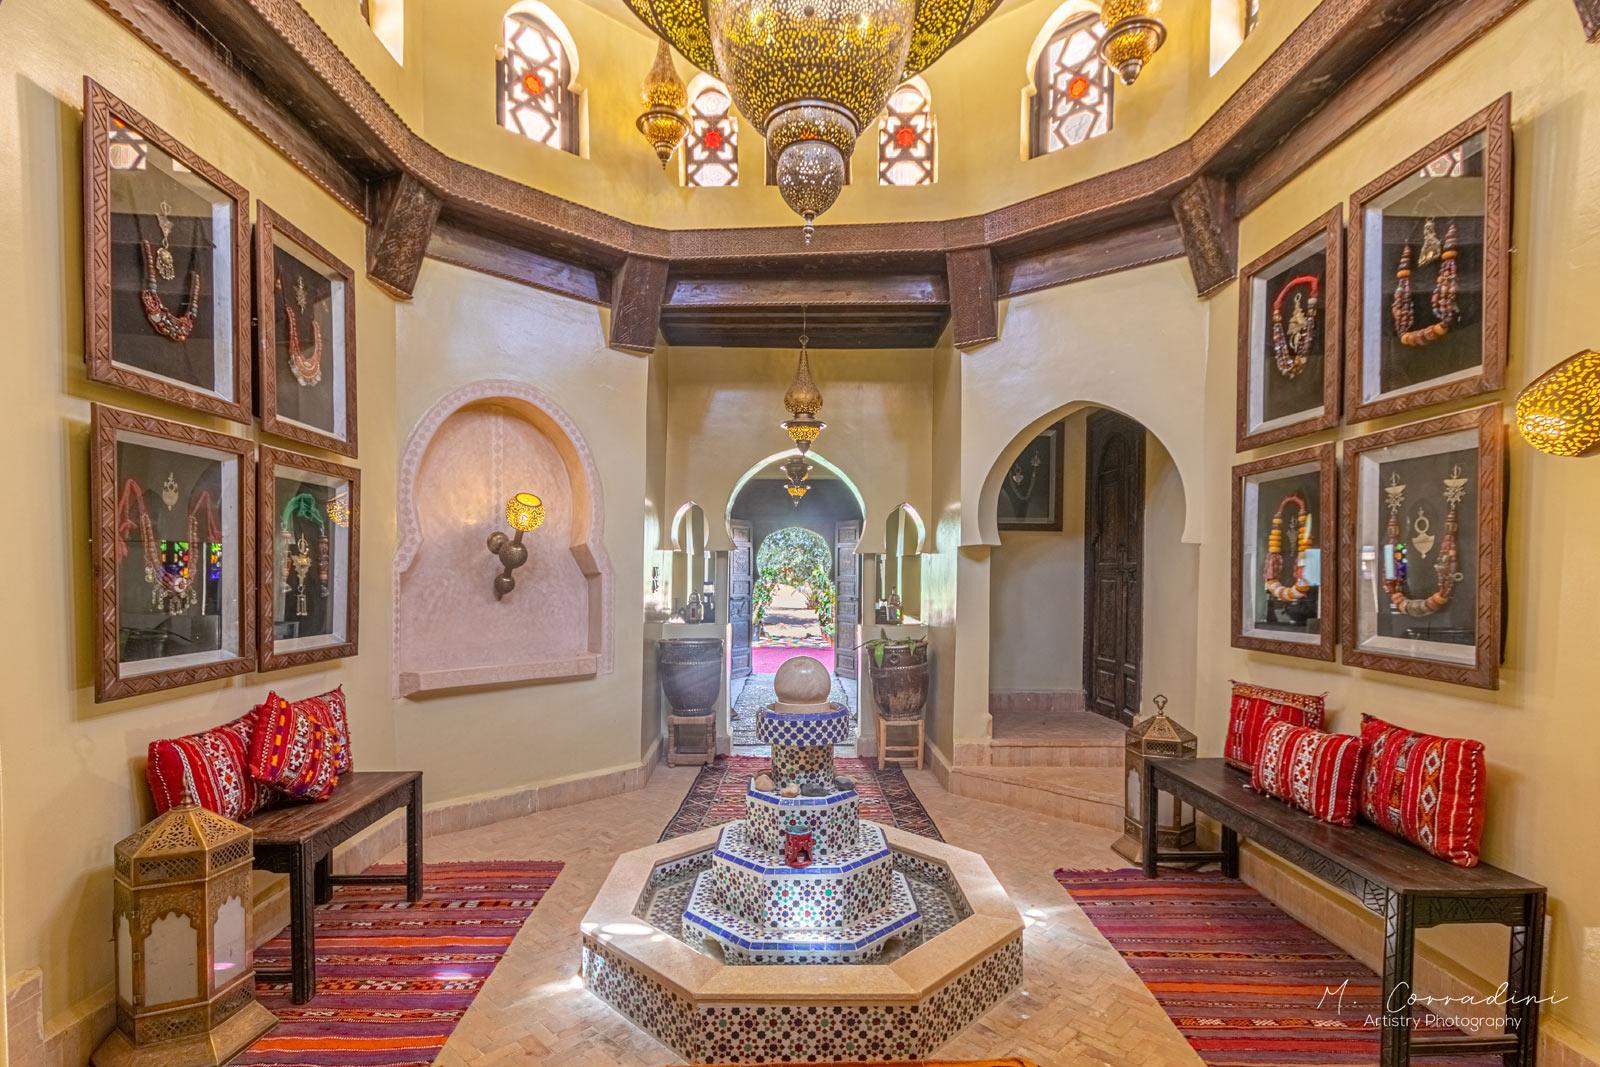 Viaje a Marruecos 2